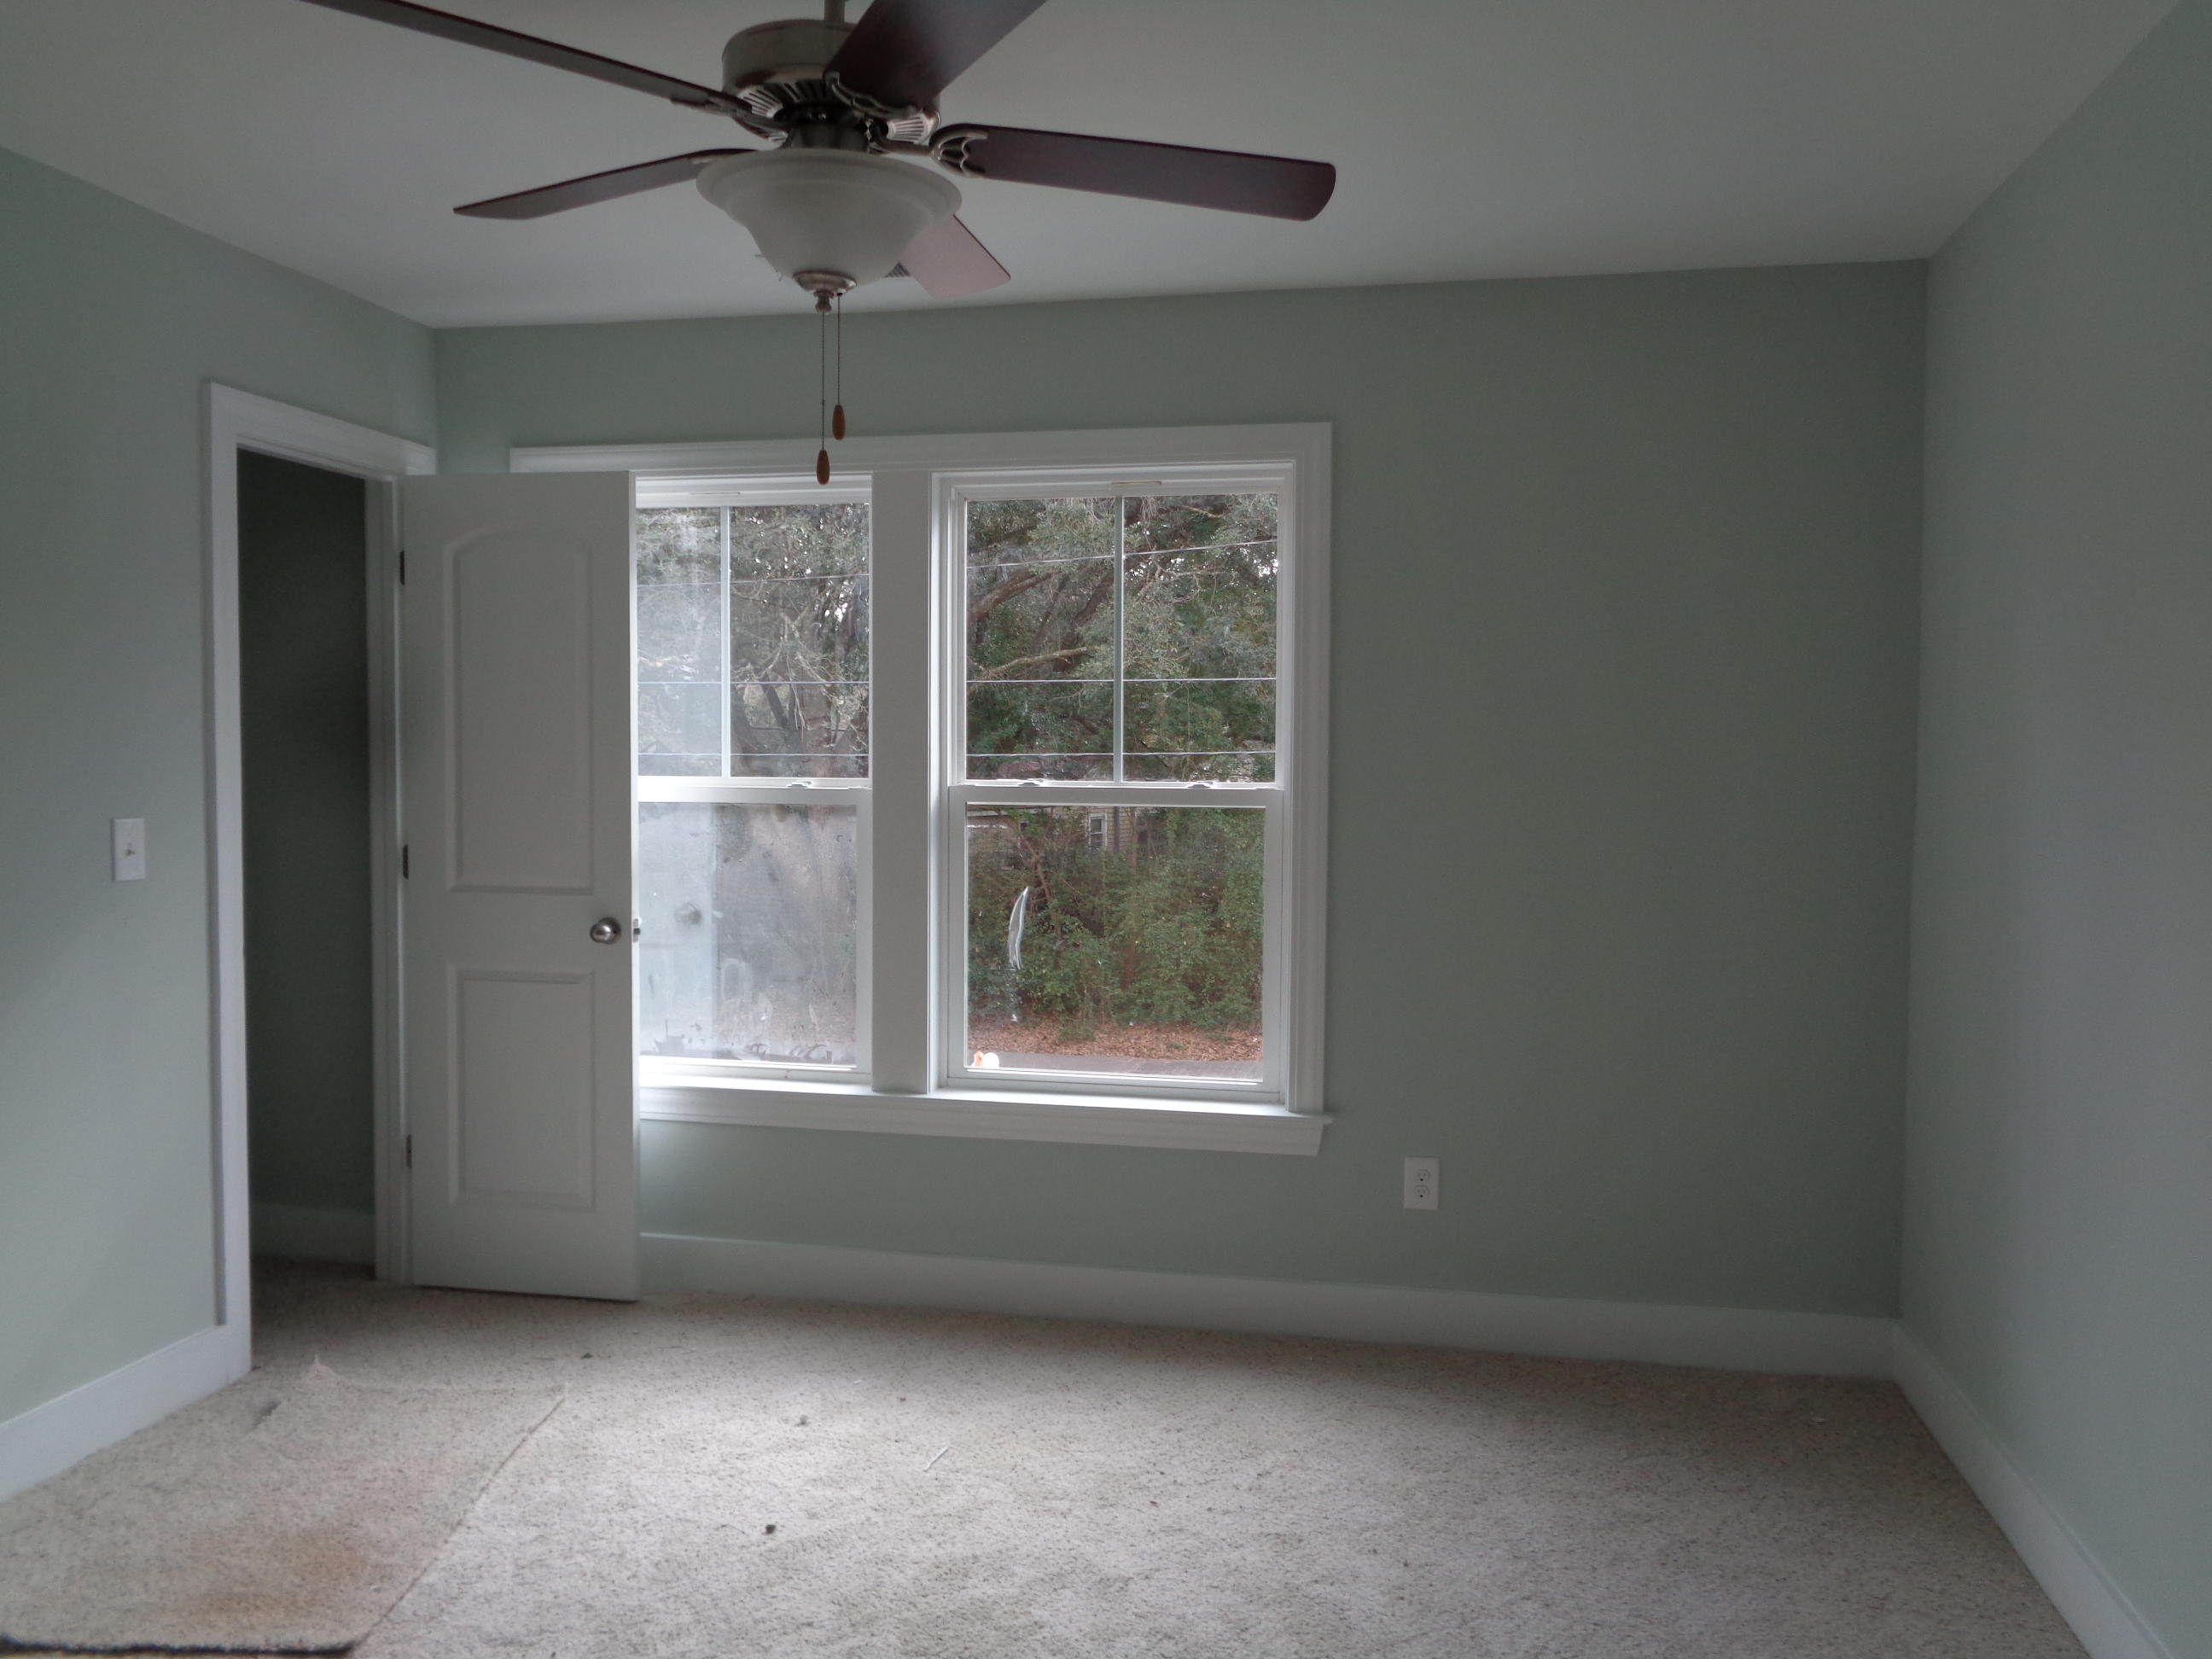 Pinecrest Gardens Homes For Sale - 1626 Wappoo, Charleston, SC - 9